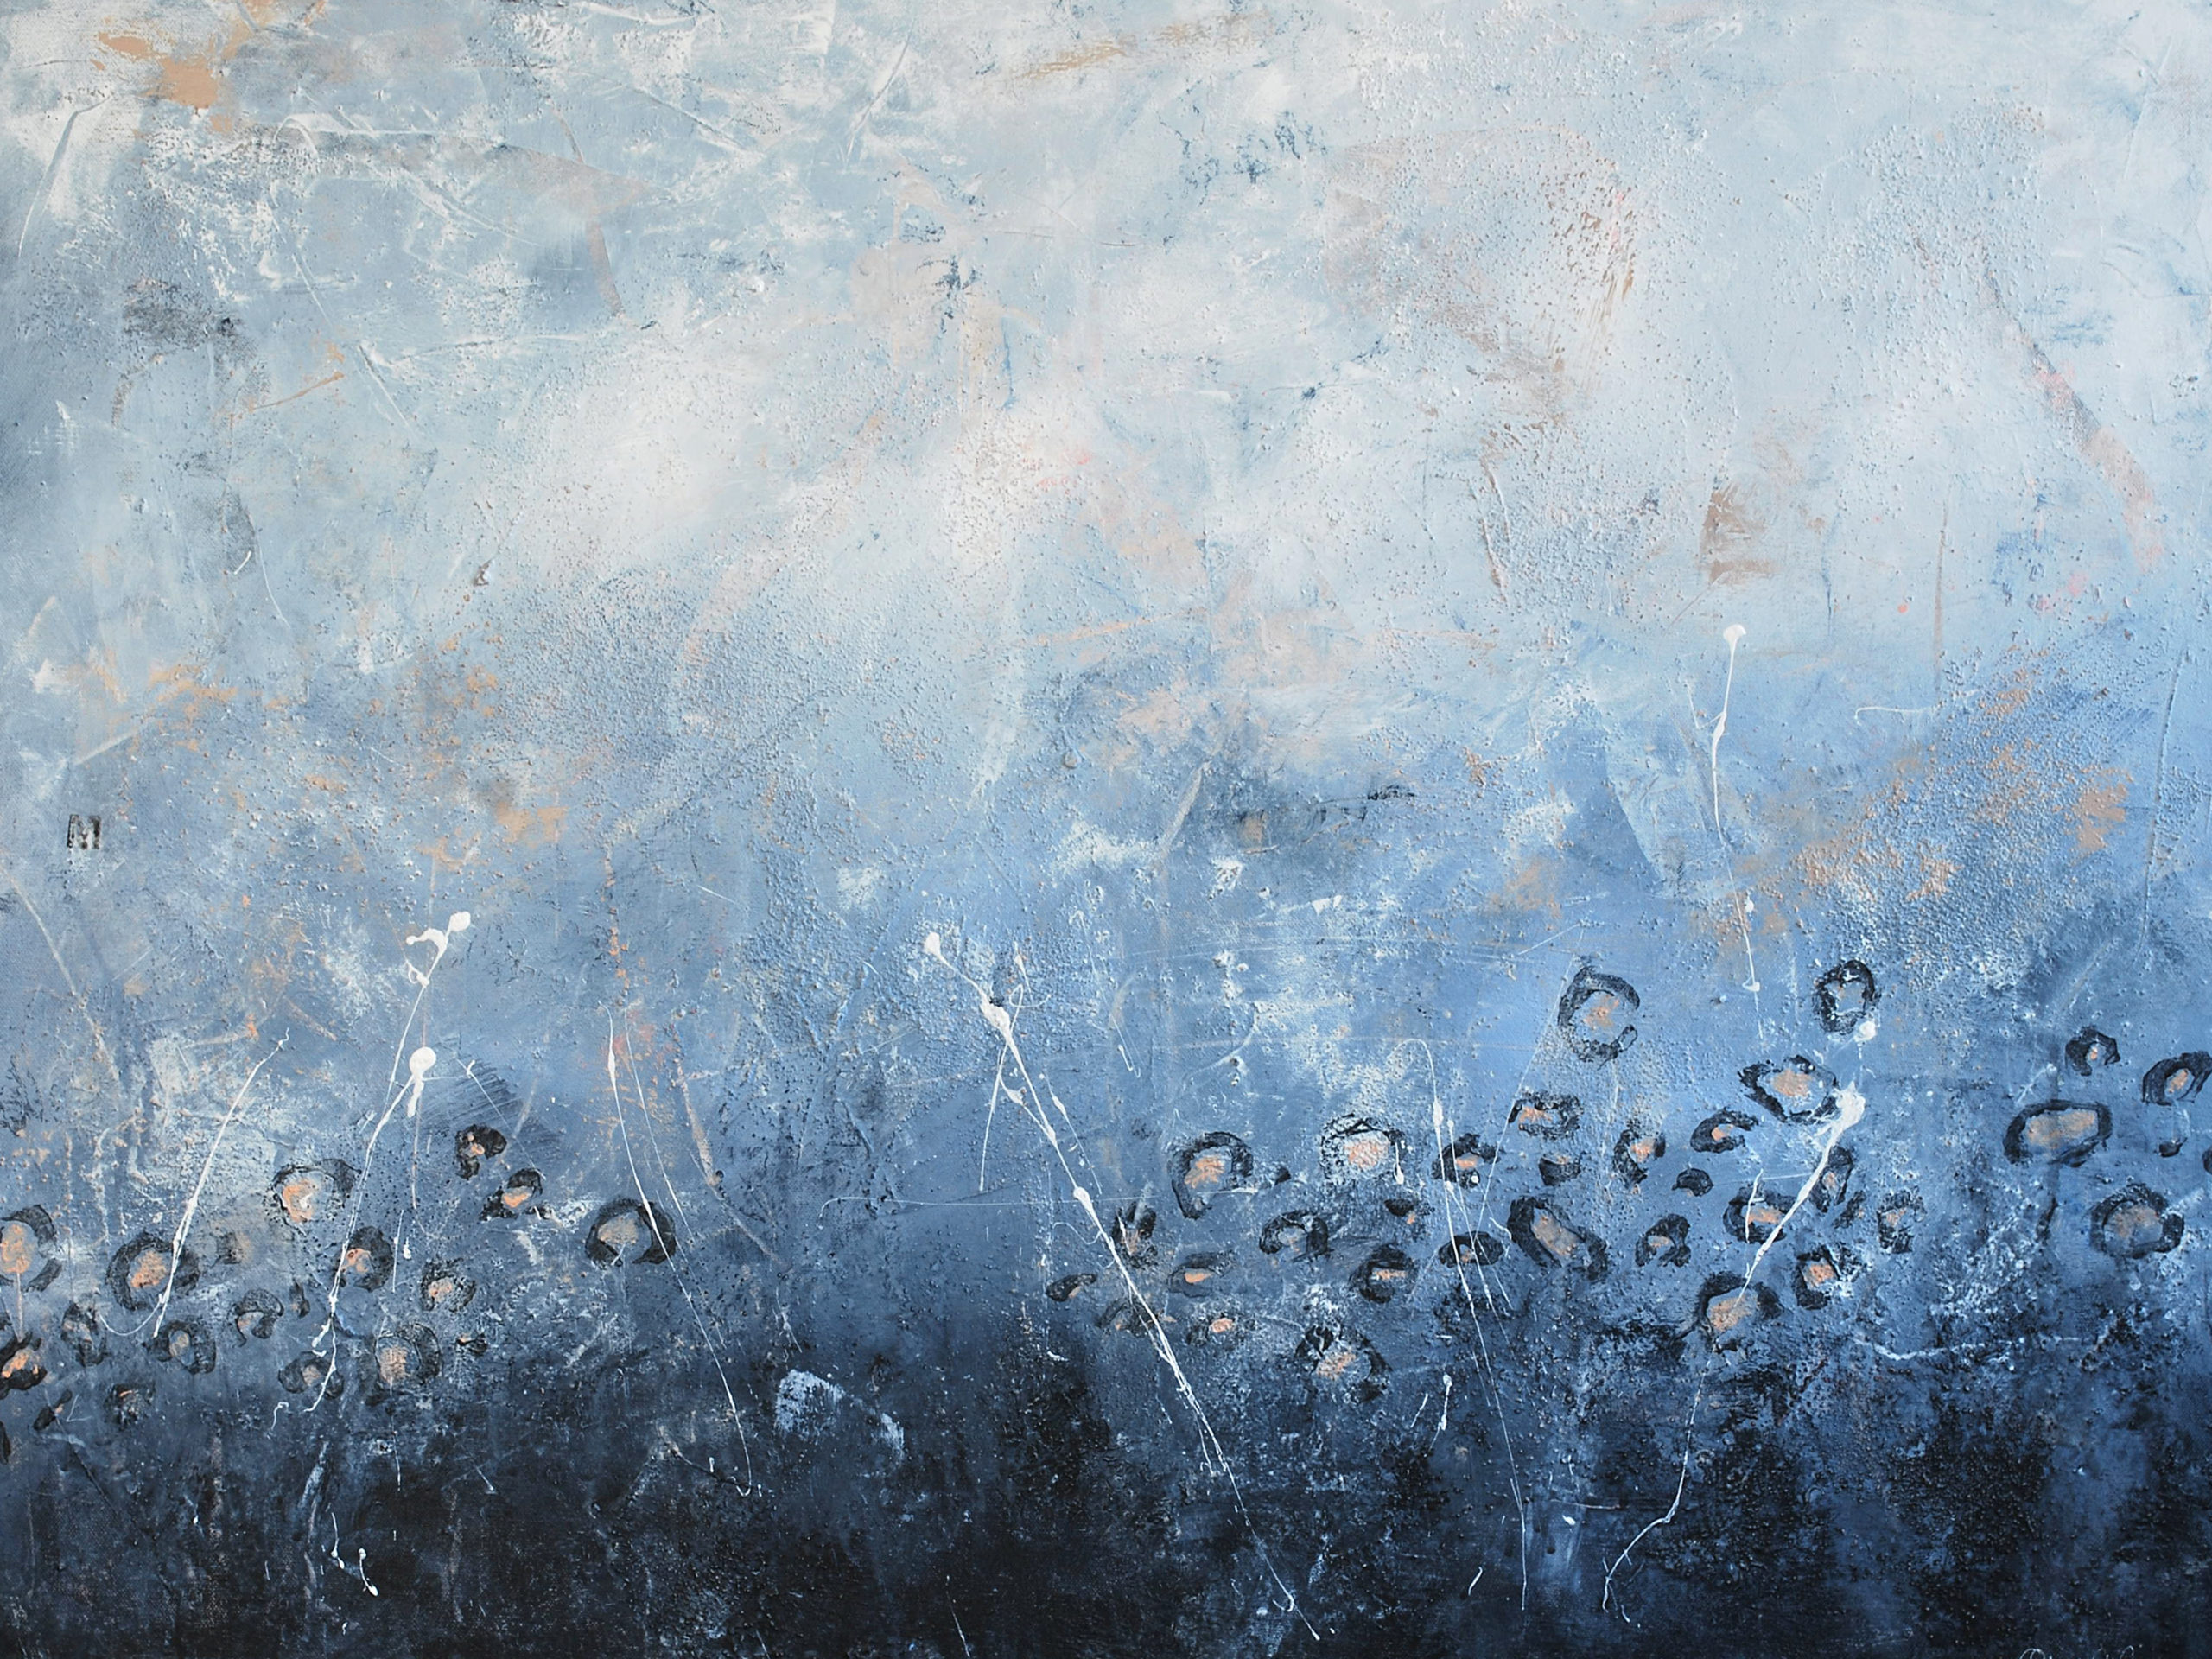 Abstrakt akrylmålning i blå nyanser